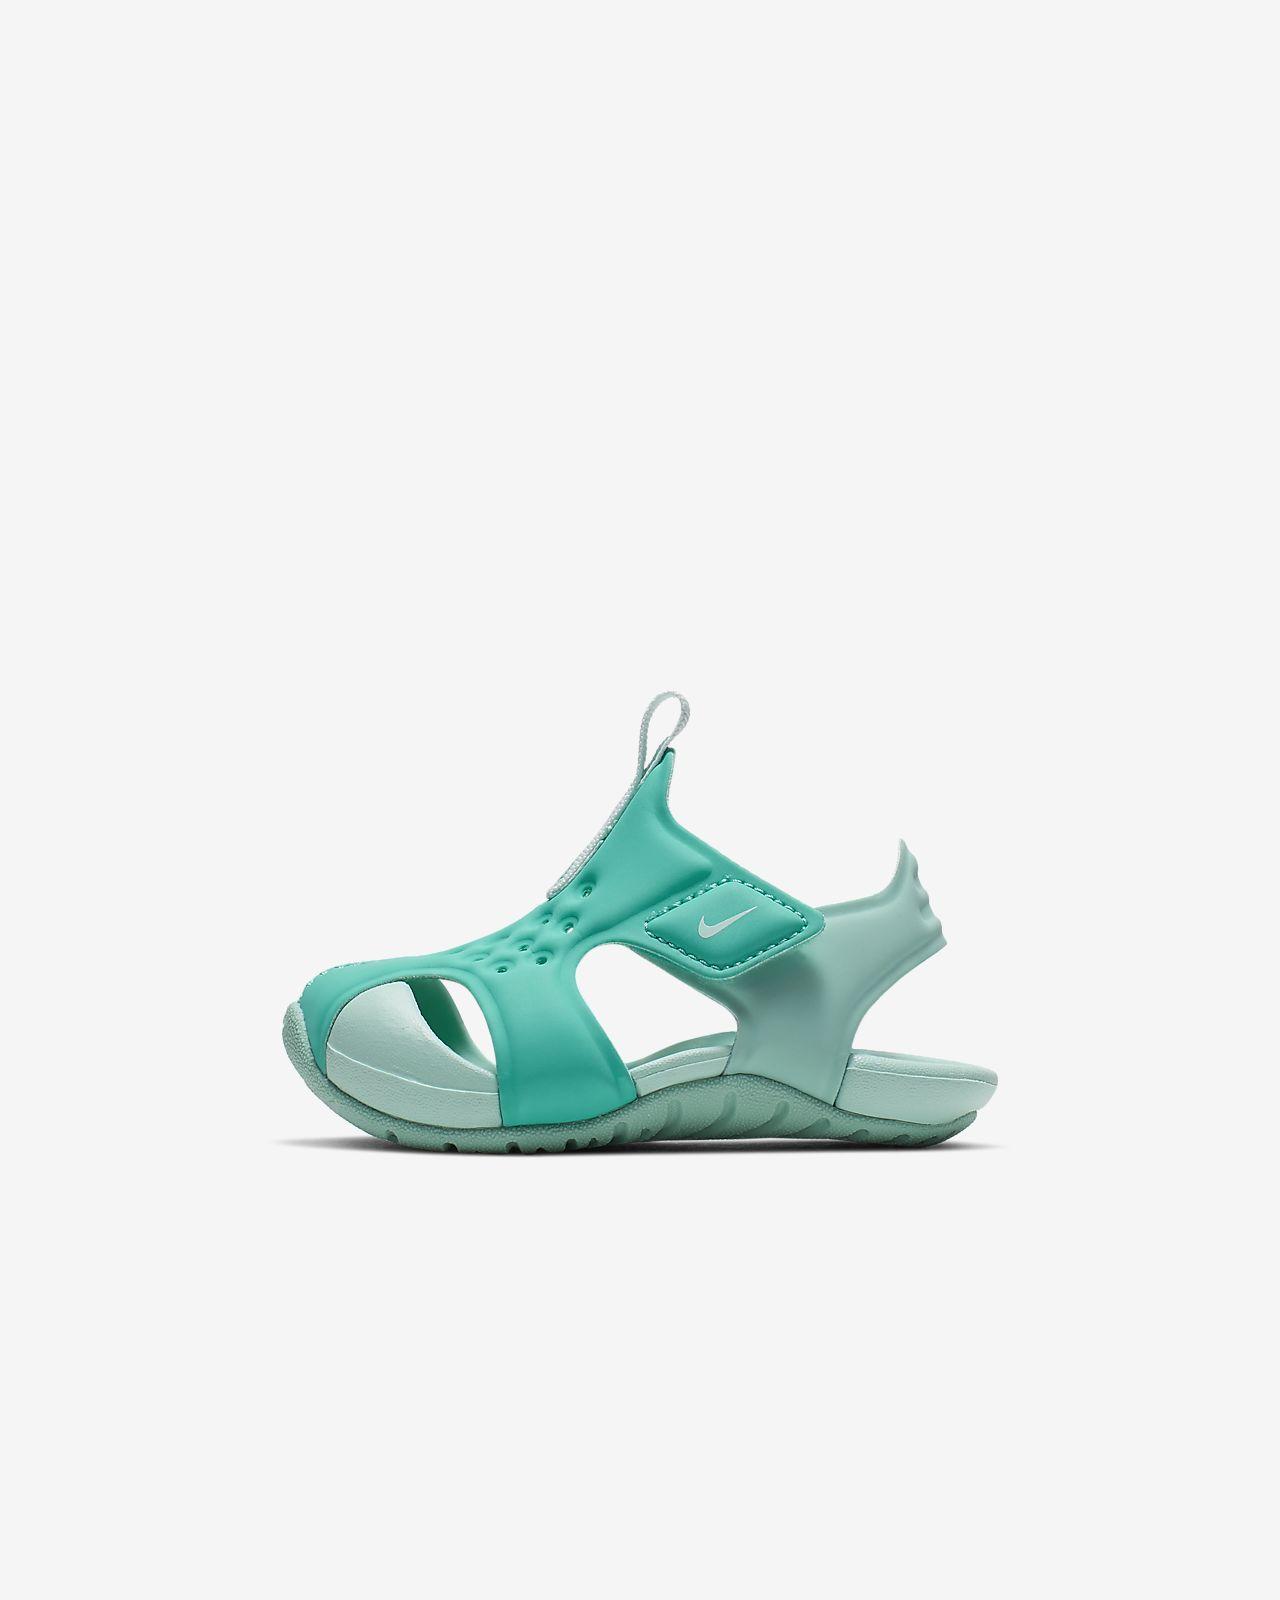 Sandal Nike Sunray Protect 2 för baby/småbarn